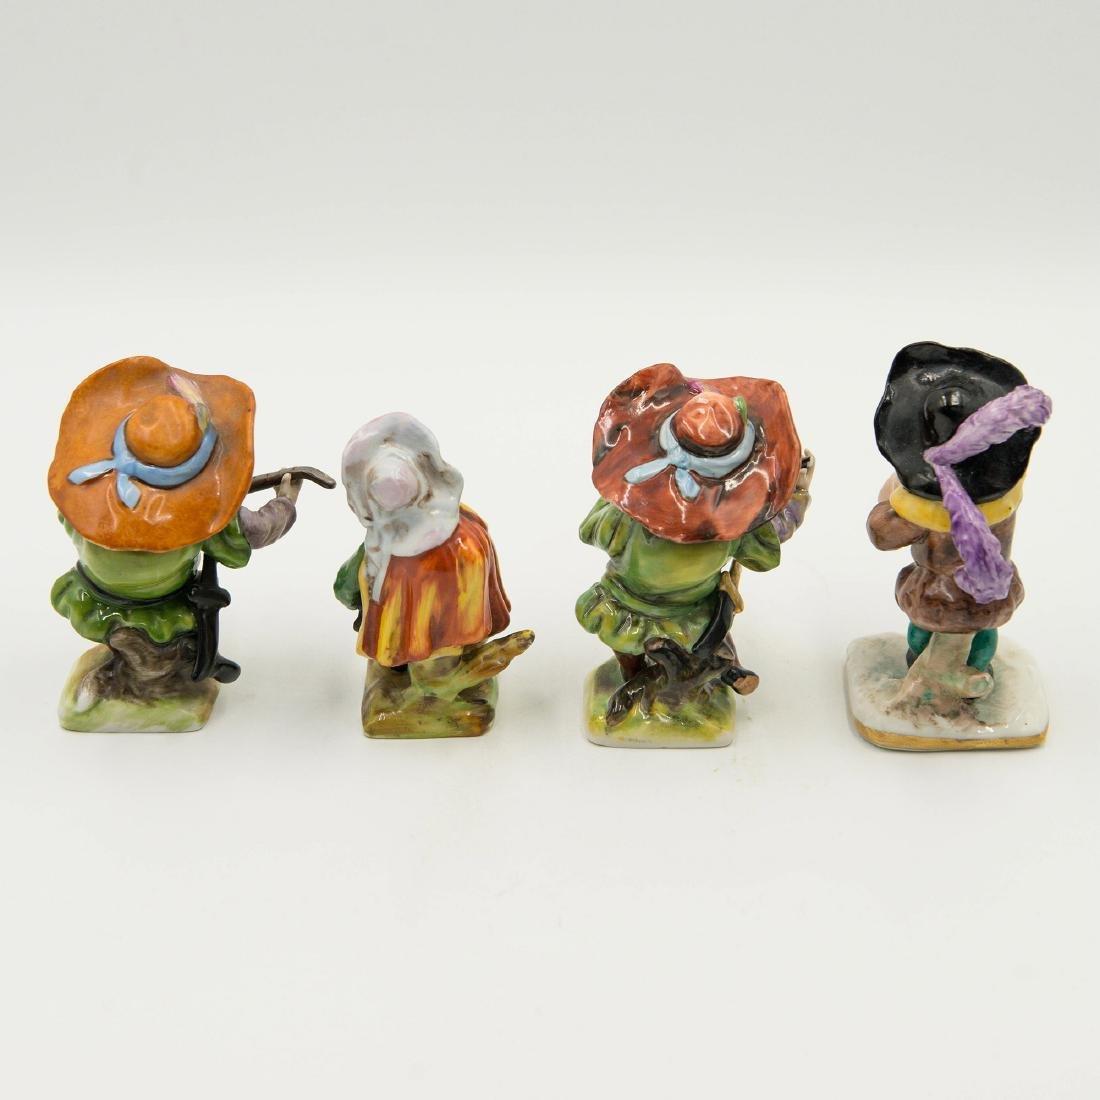 Capodimonte Porcelain Group of 4 Gnomes Dwarfs - 2